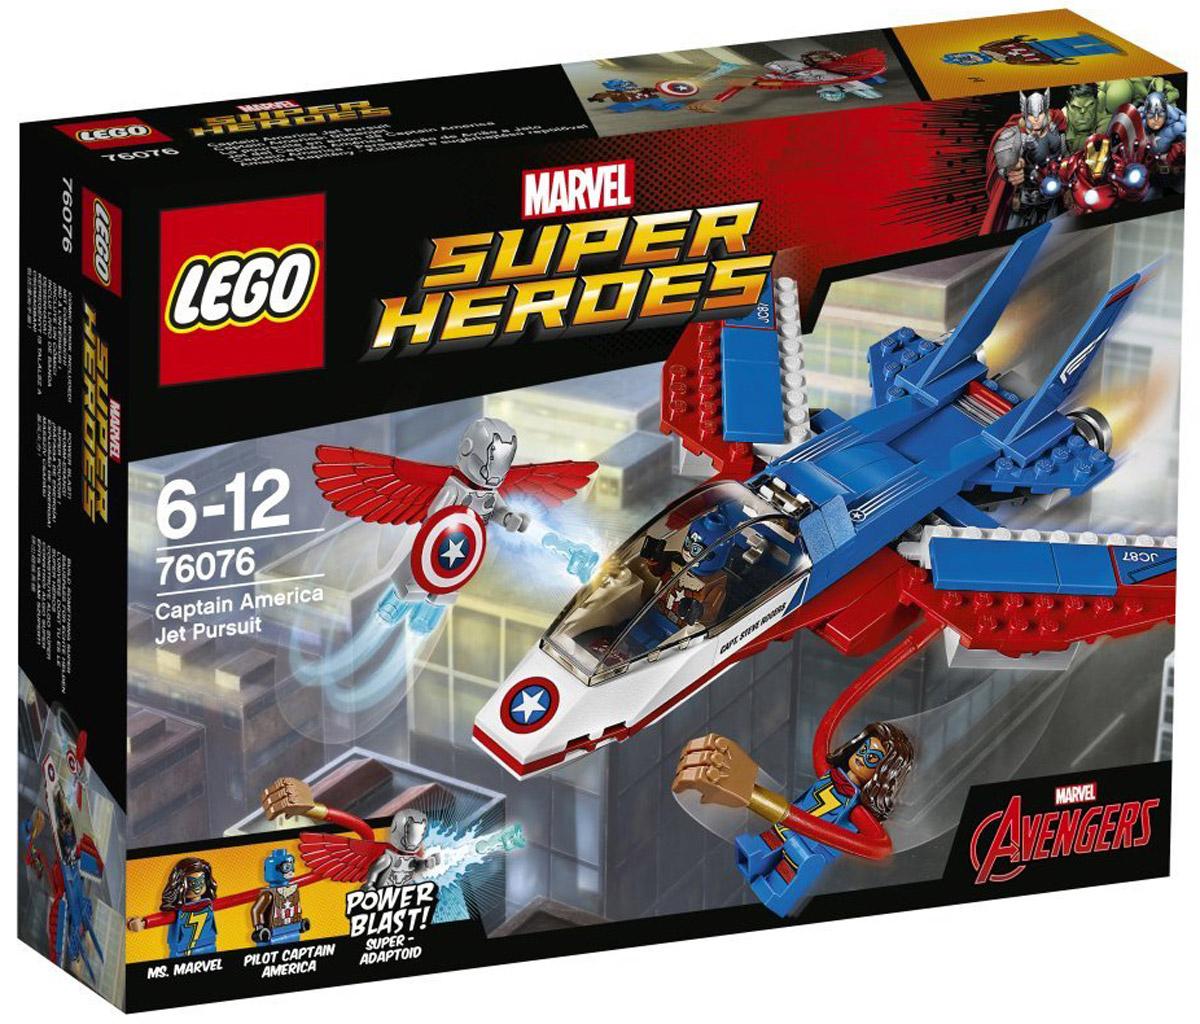 LEGO Super Heroes Конструктор Воздушная погоня Капитана Америка 76076 конструкторы lego lego воздушная погоня капитана америка 76076